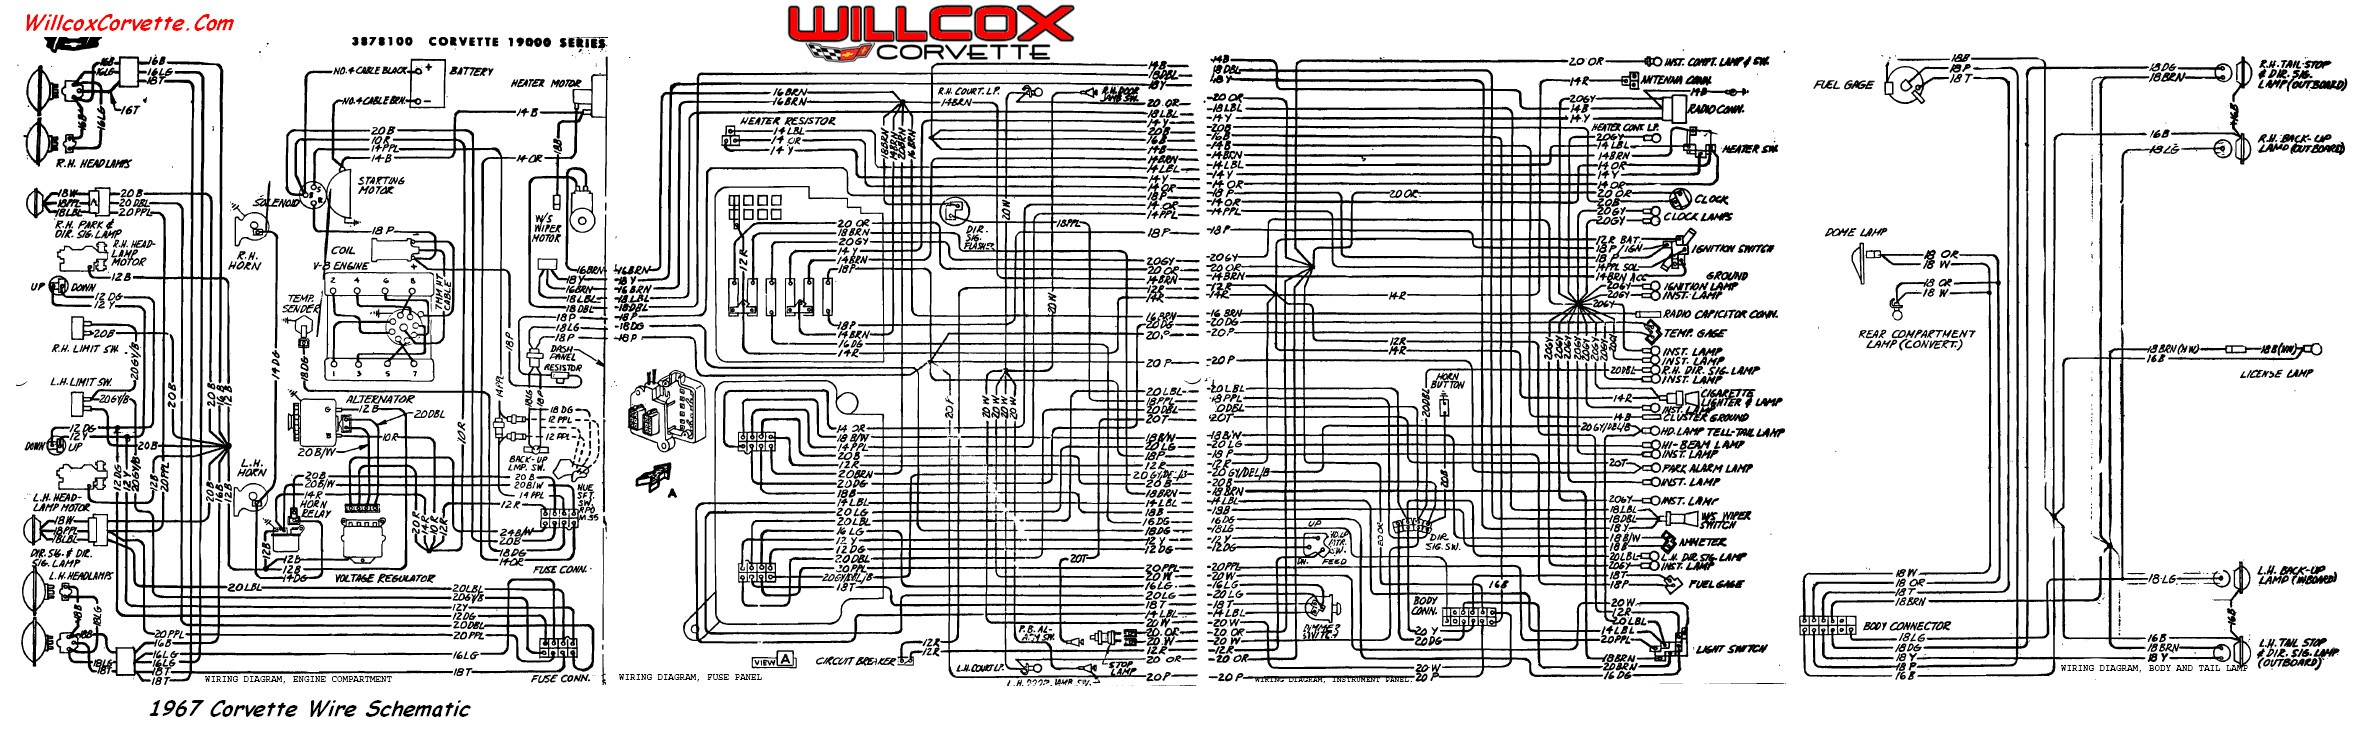 1973 Corvette Wiring Diagram Free